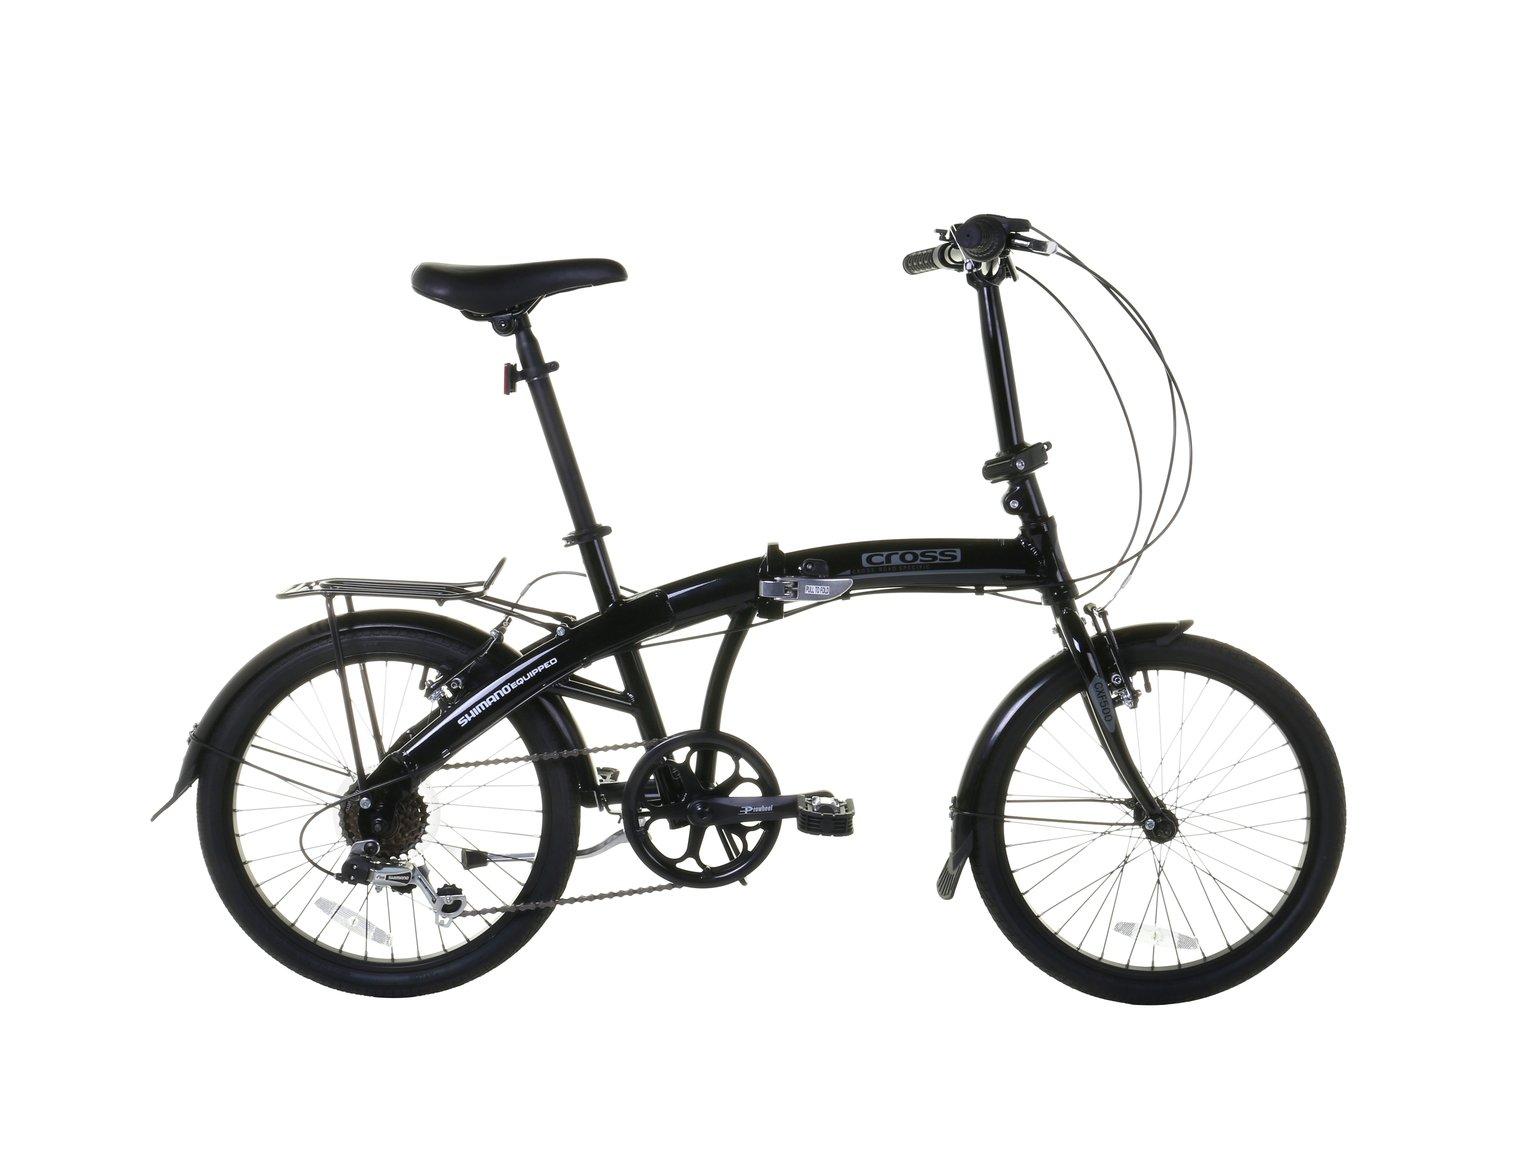 Image of Cross Commuter Light Alloy 20 Inch Bike